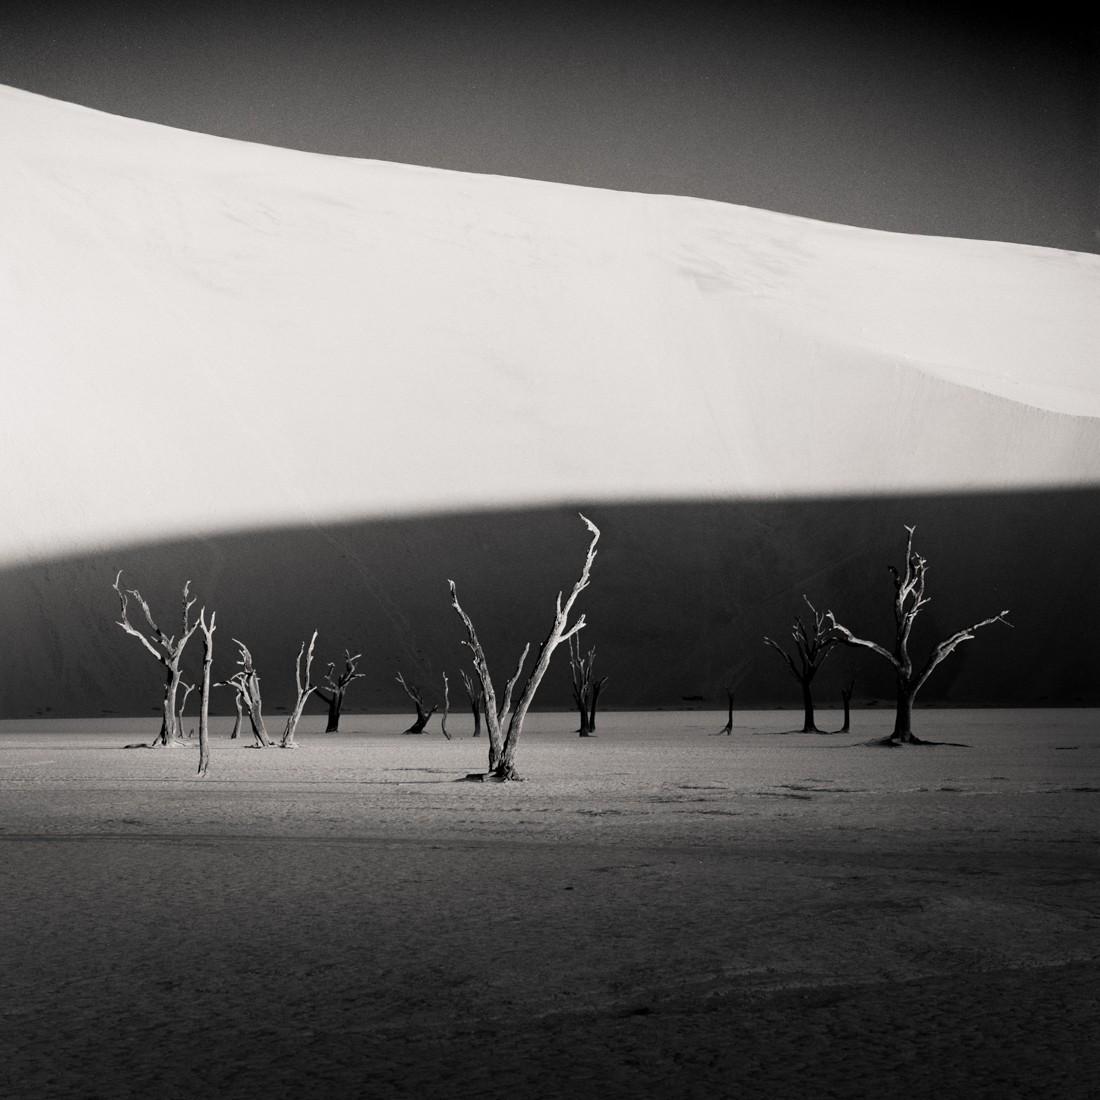 3-е место Black and White Minimalist Photography Prize 2020–2021. Деревья в Намибии. Фотограф Гектор Искьердо Селива